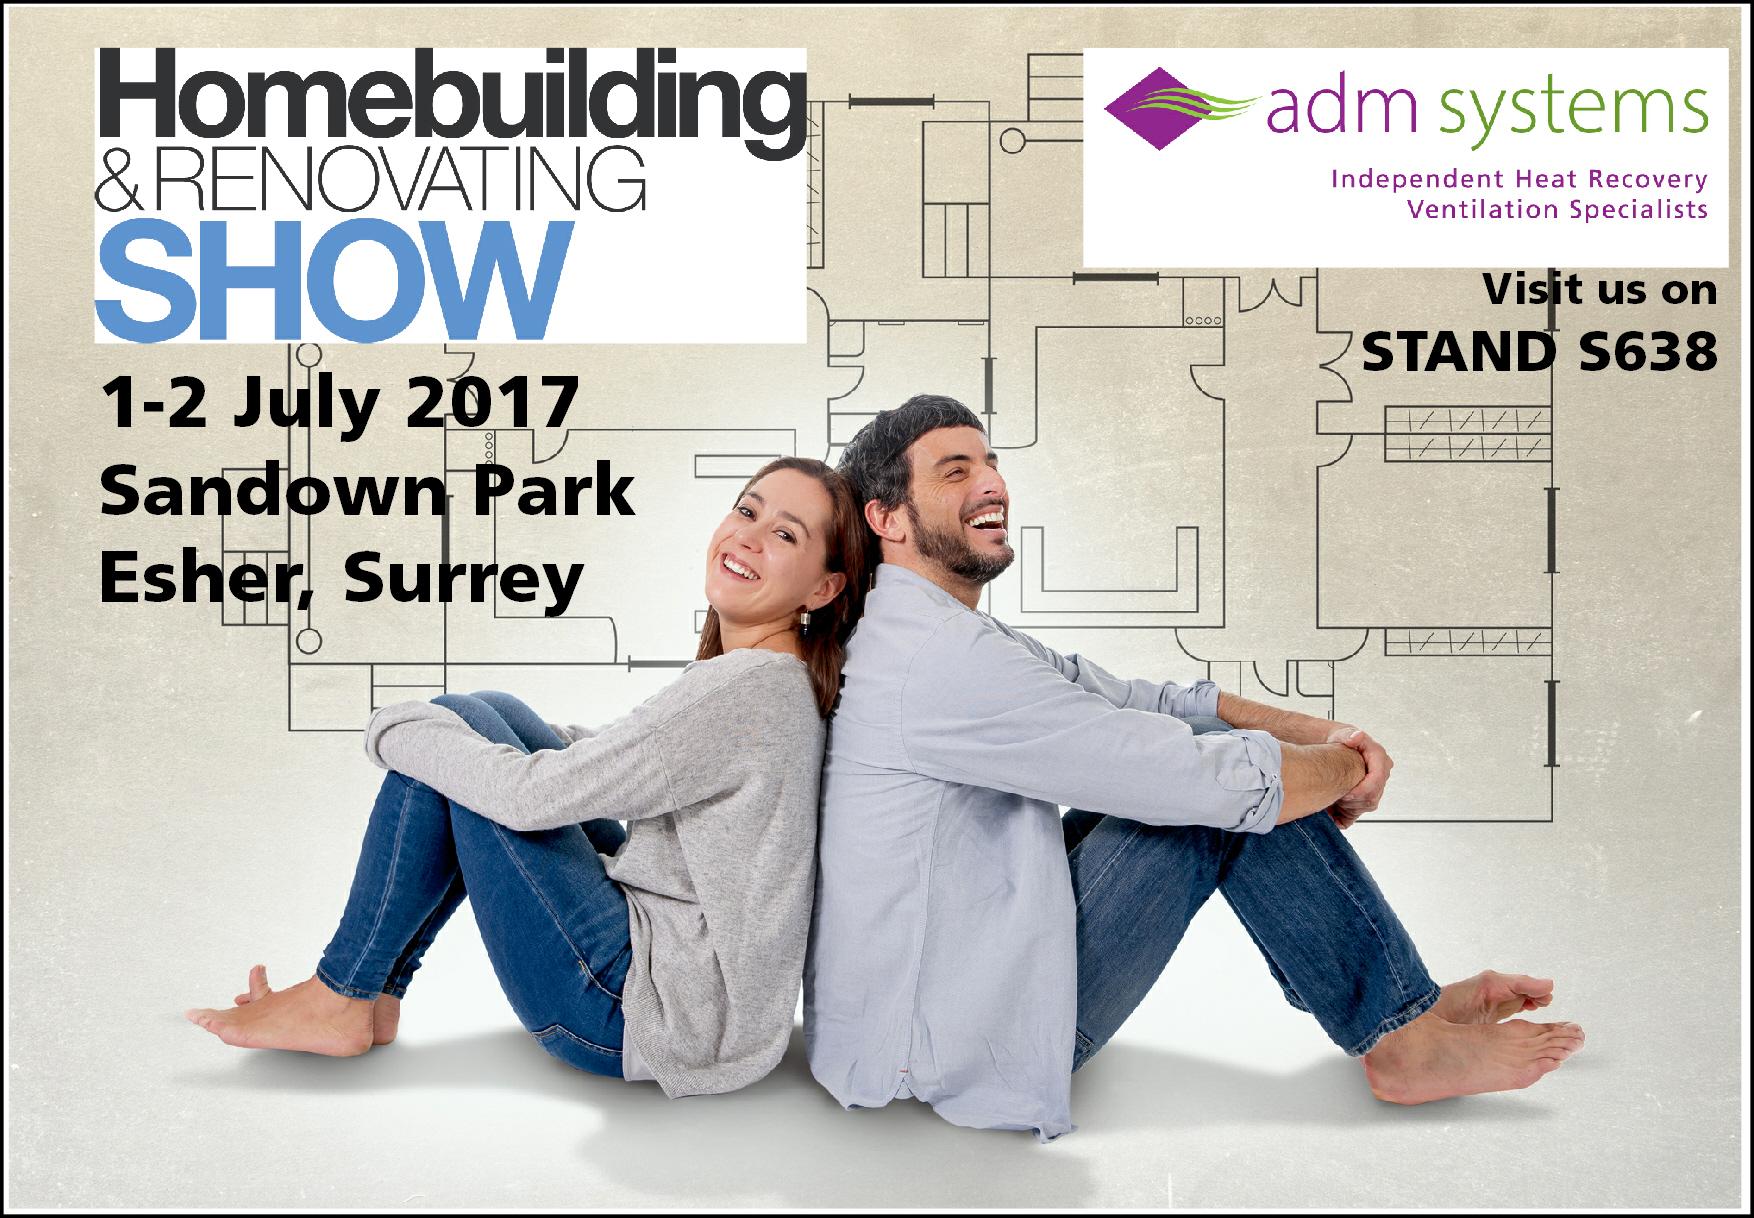 HBRS Show Surrey 2017